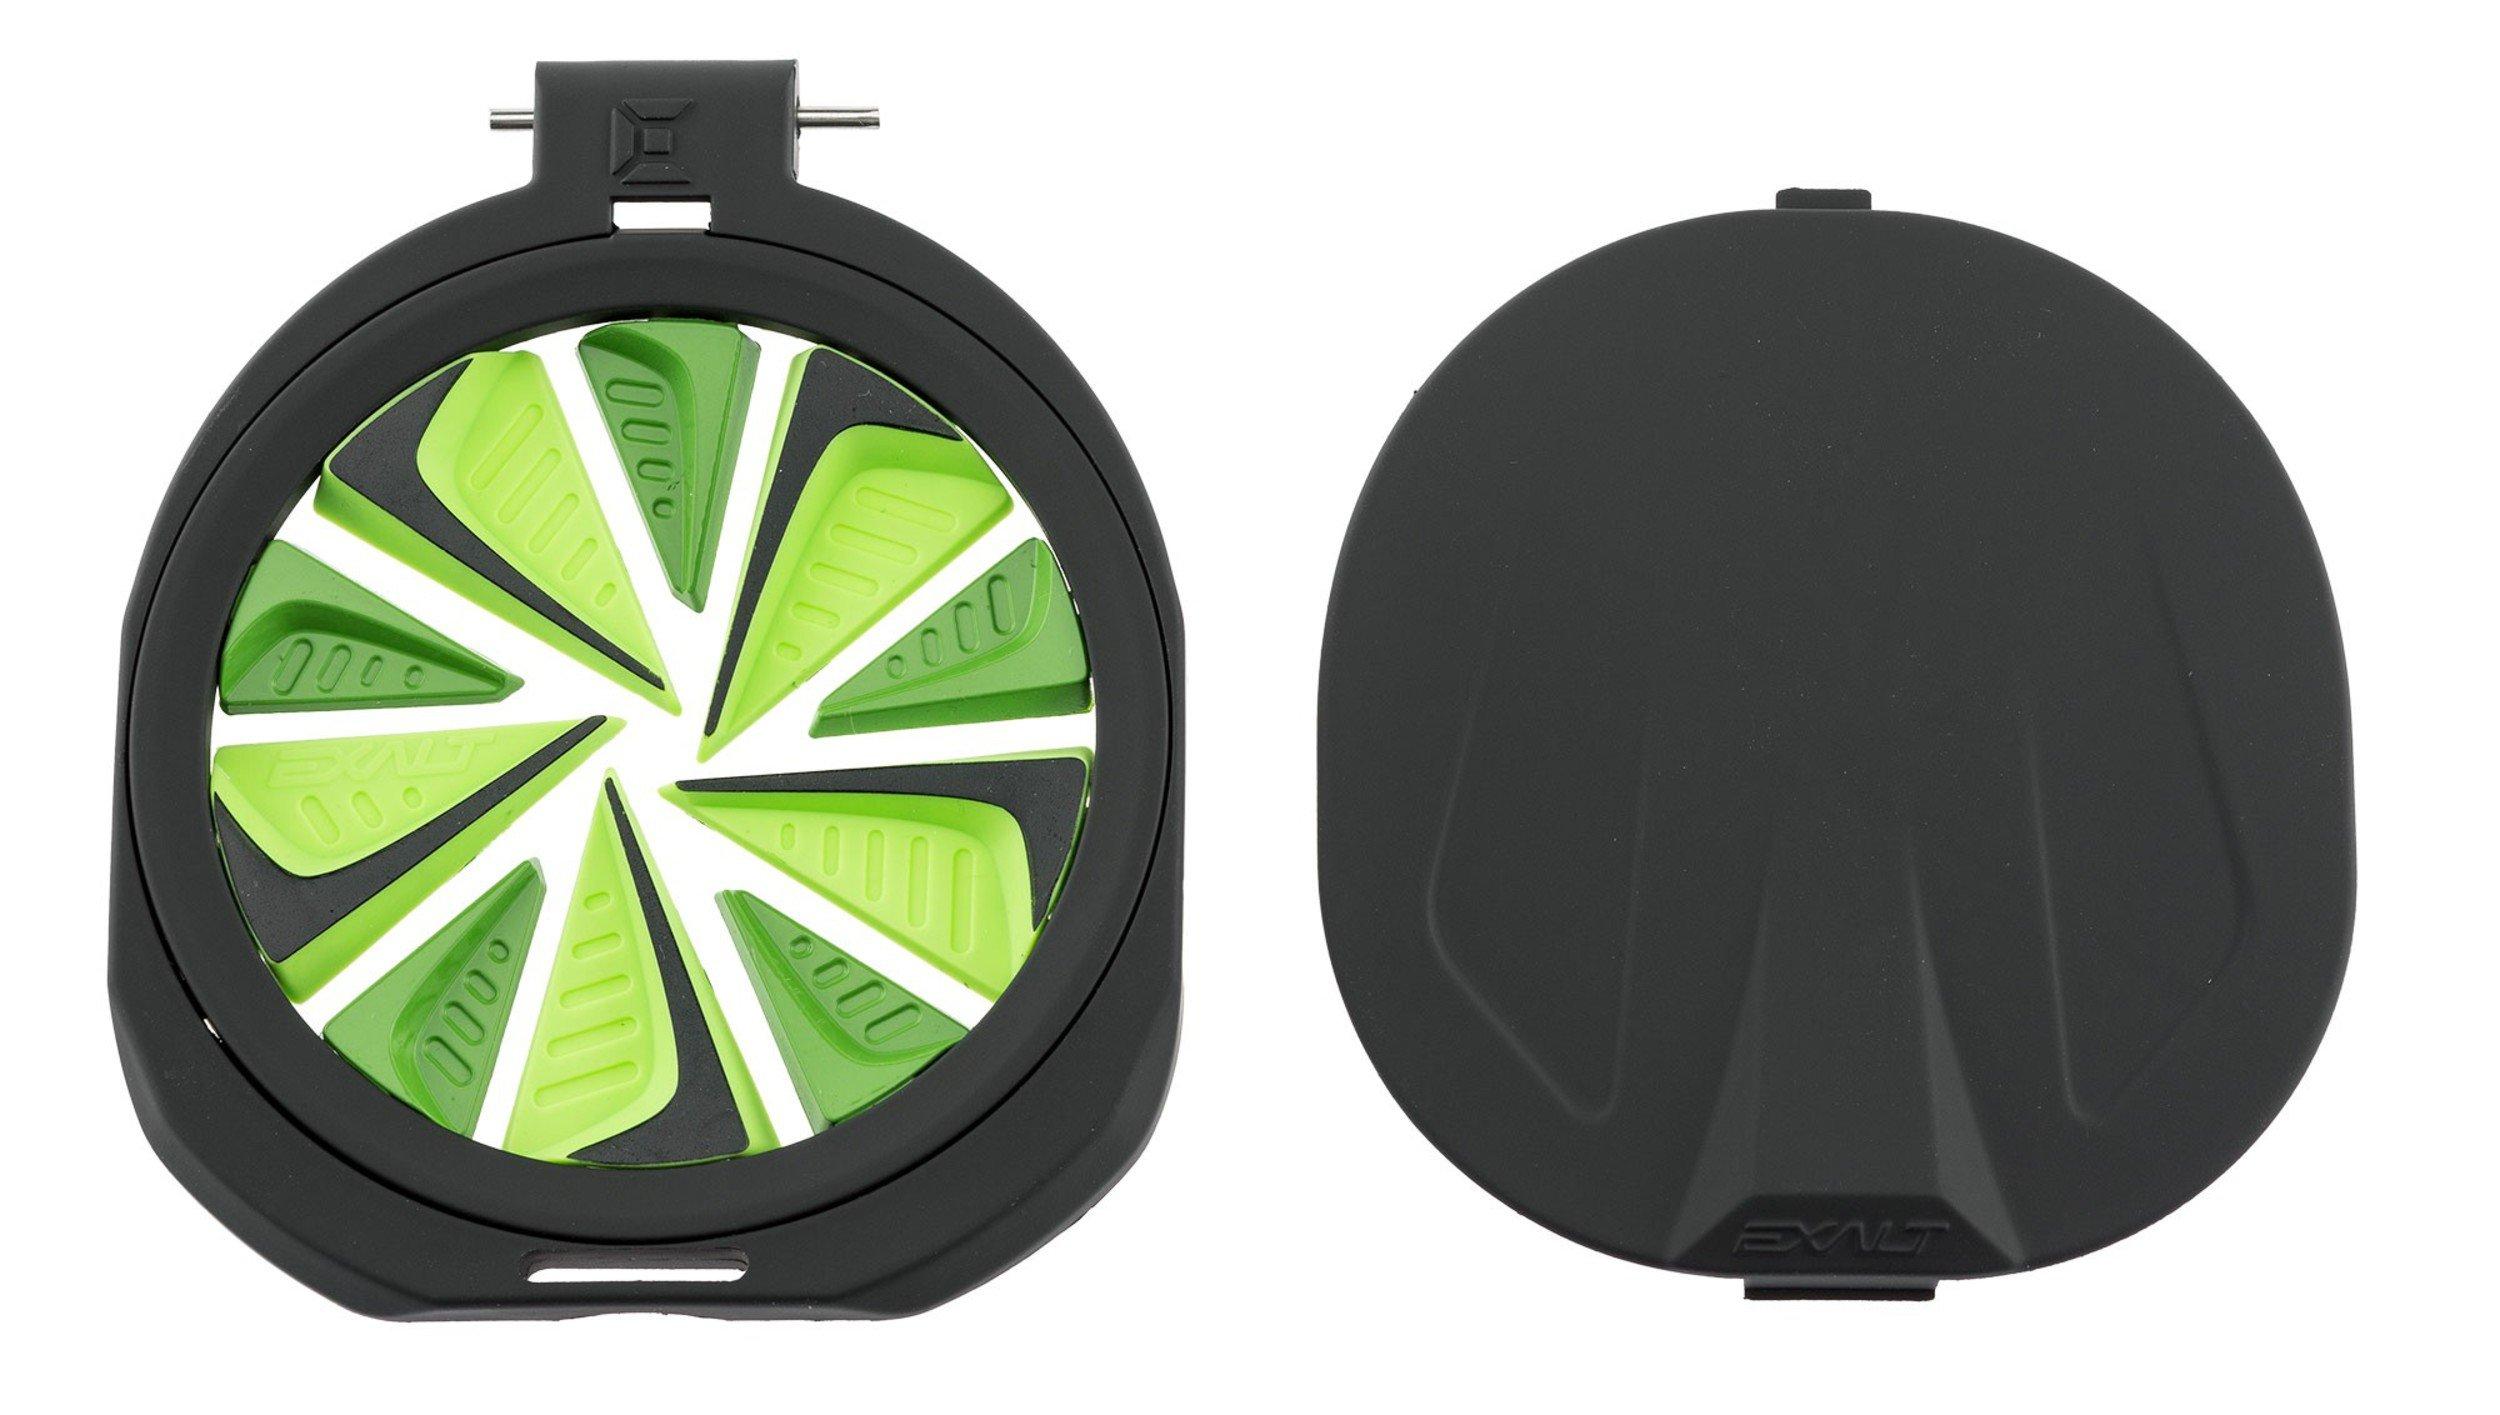 Exalt Paintball Spire FastFeed Loader FeedGate - Lime Green by Exalt